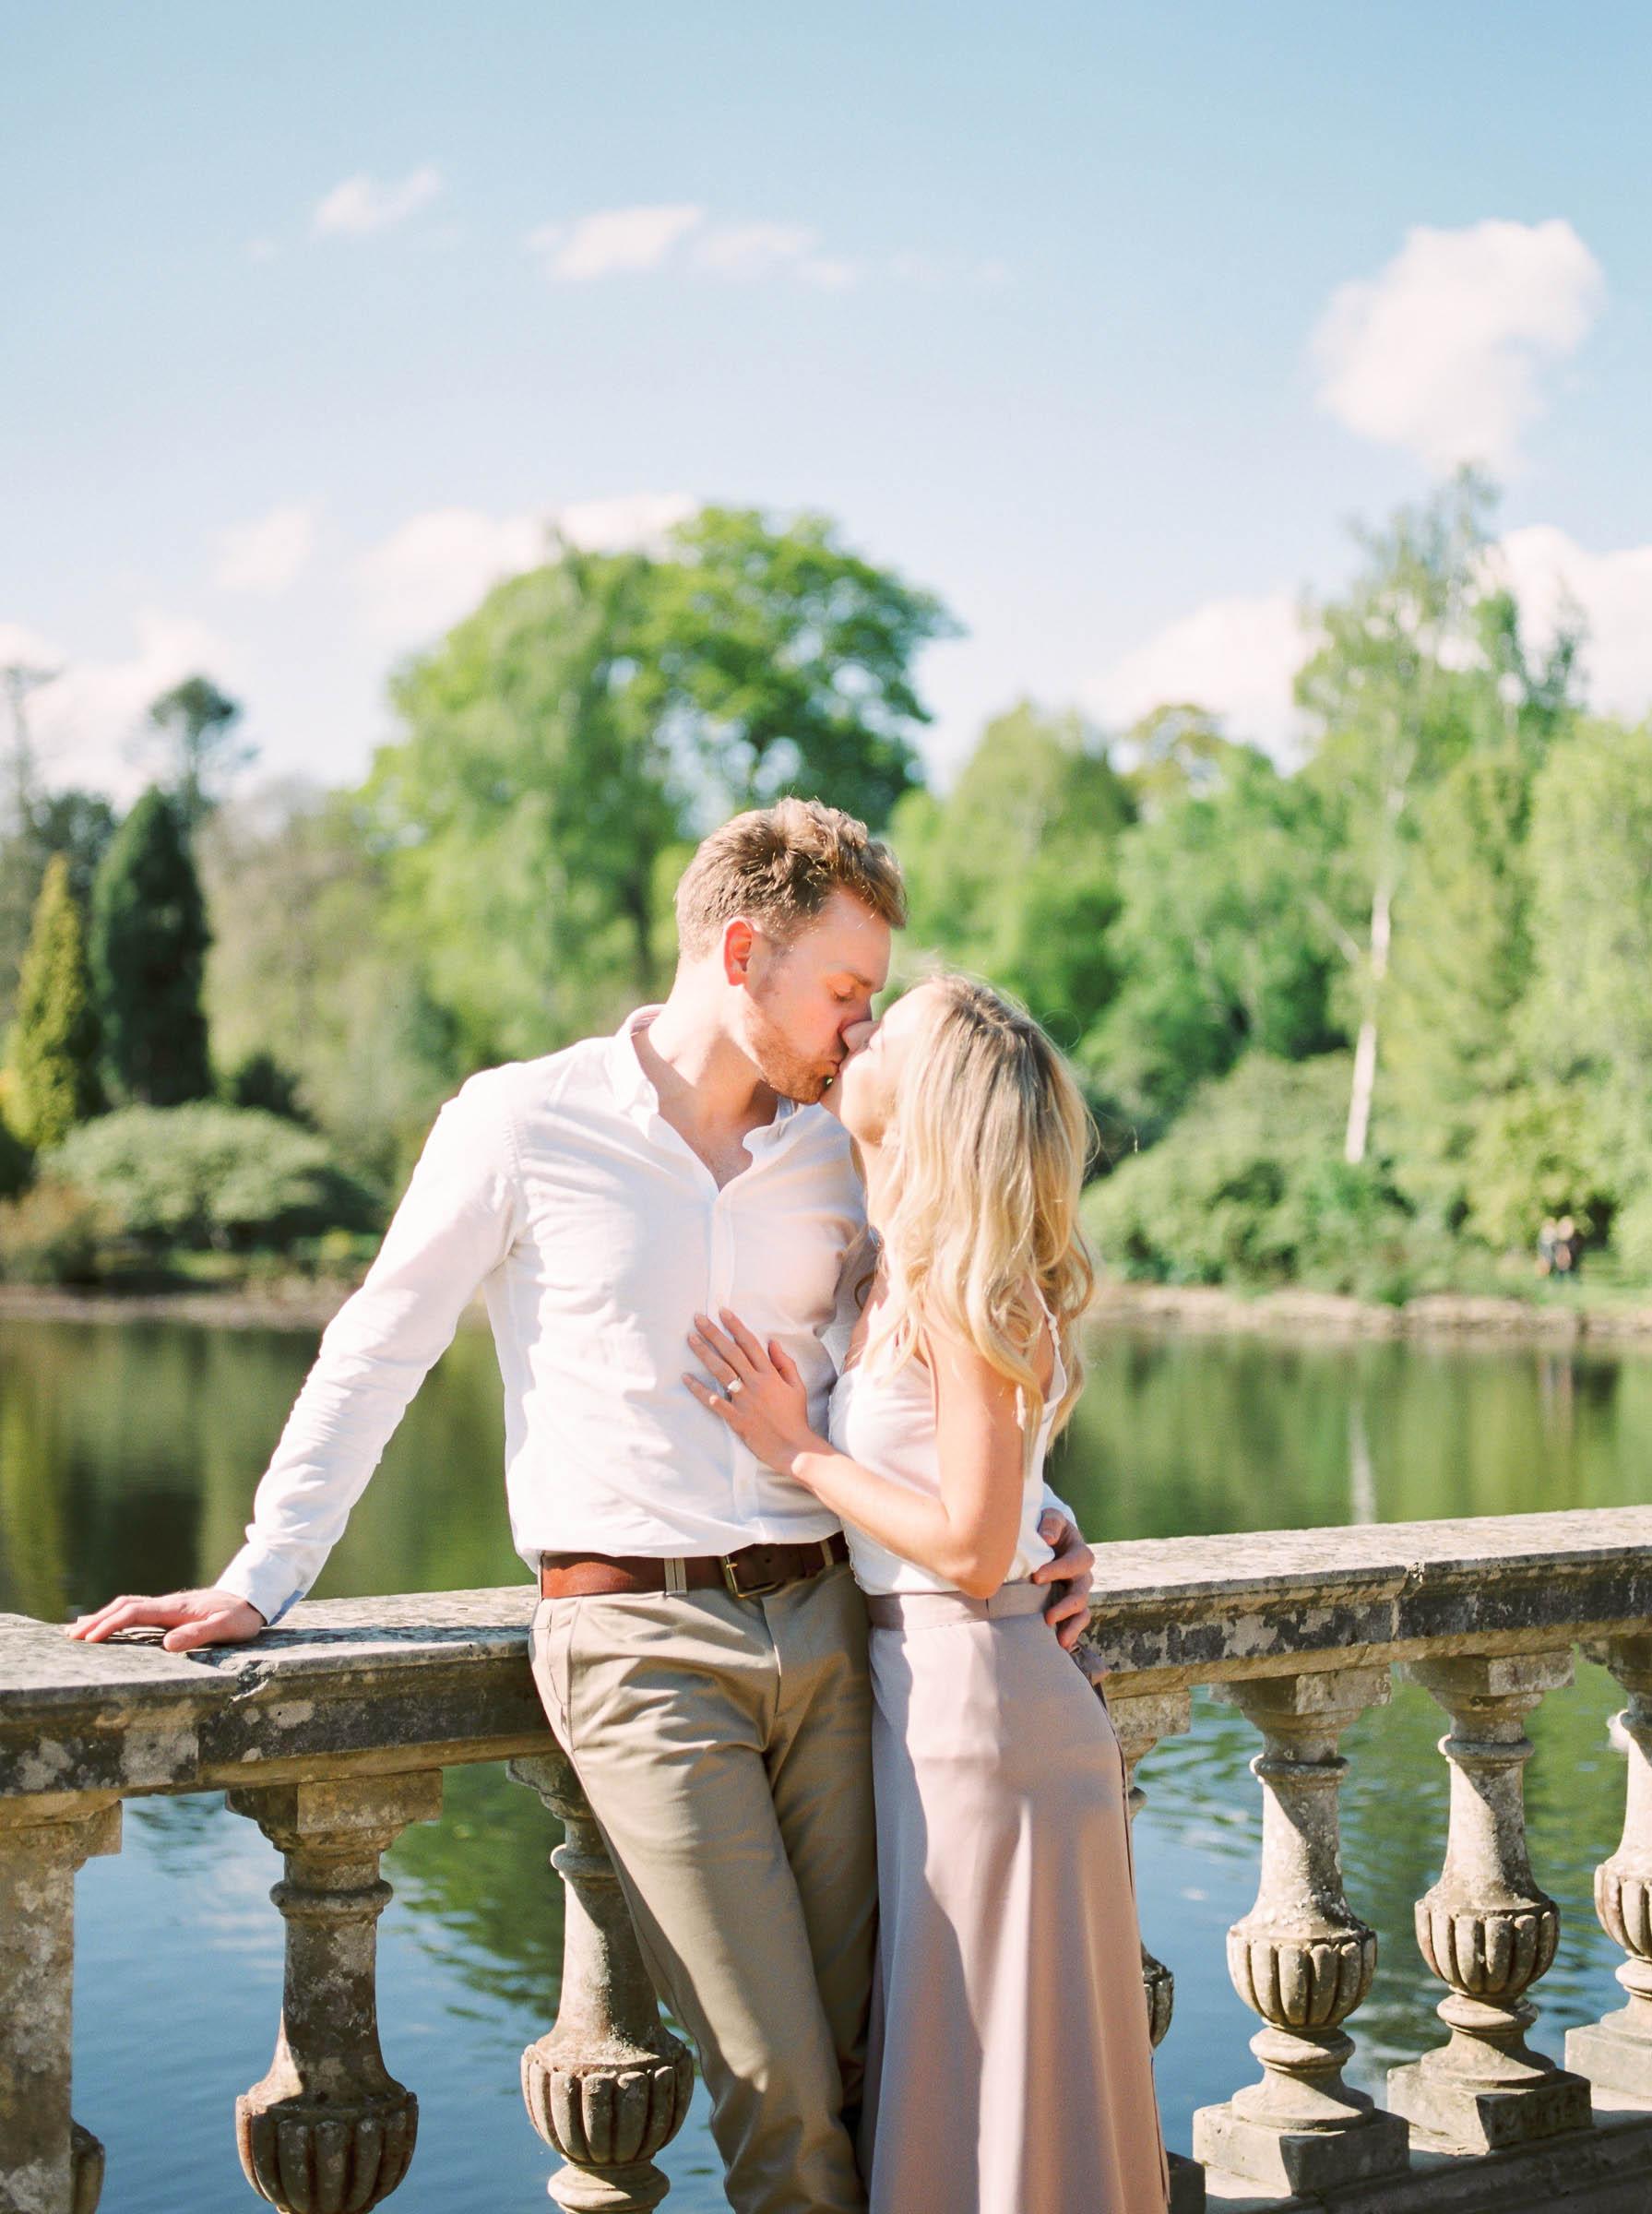 Amy O'Boyle Photography- Destination & UK Fine Art Film Wedding Photographer- Sheffield Park Garden National Trust Spring Engagement Shoot-26.jpg